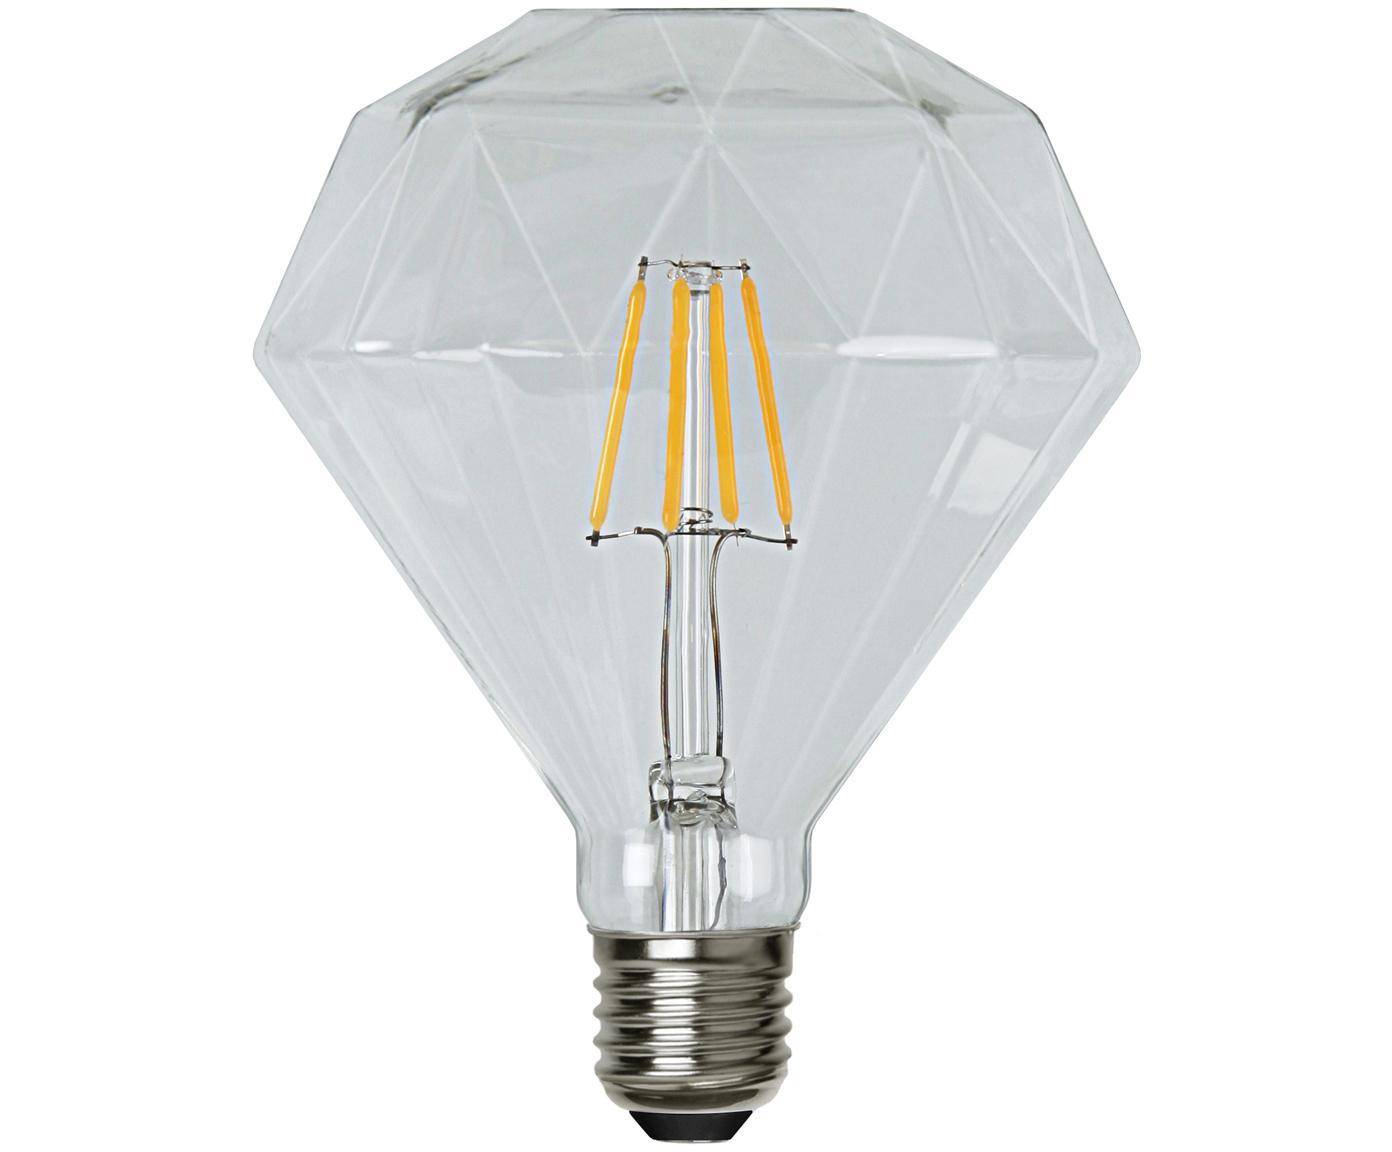 Lampadina a LED Diamond (E27 / 3Watt), Paralume: vetro, Base lampadina: nichel, Trasparente, Ø 12 x Alt. 13 cm